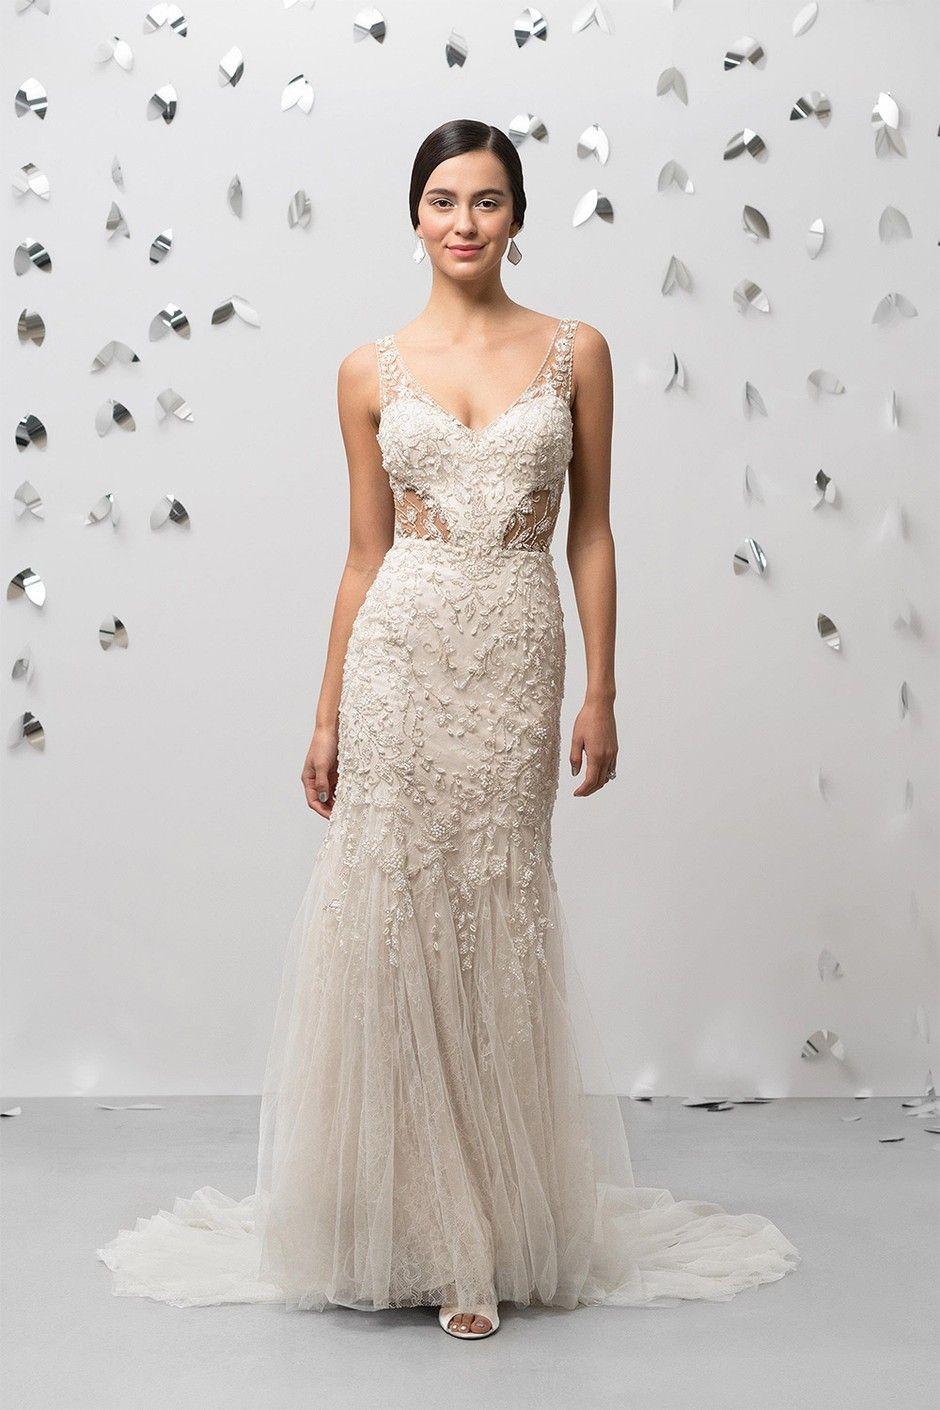 17 Beautiful Vintage Inspired Wedding Dresses Vintage Style Wedding Dresses Vintage Inspired Wedding Dresses Wedding Dresses